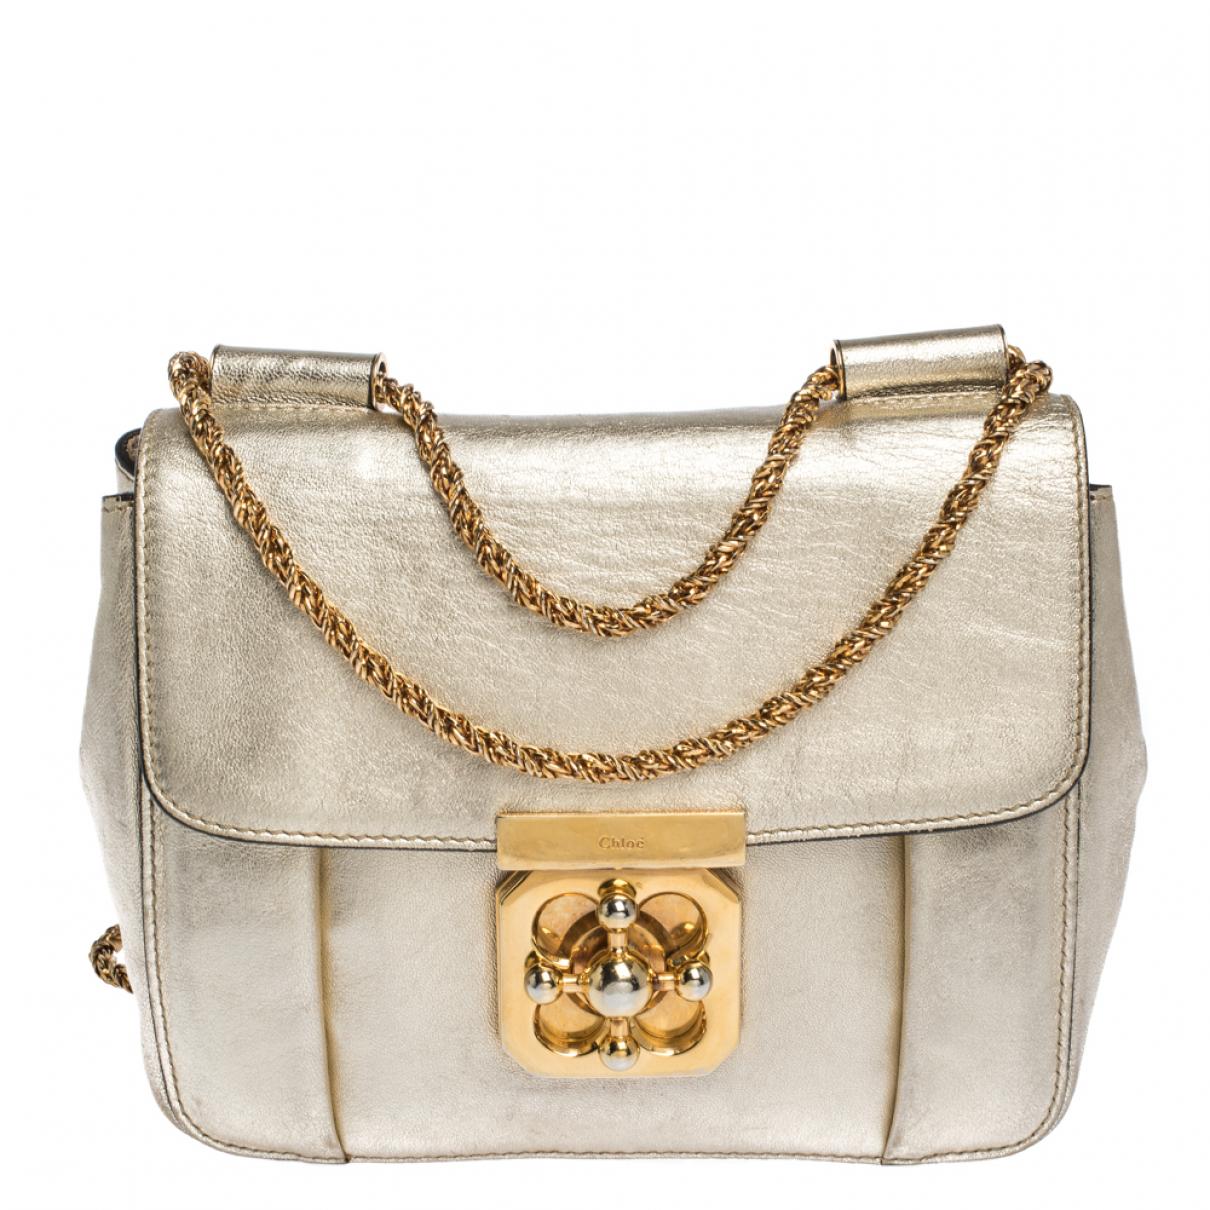 Chloé \N Metallic Leather handbag for Women \N